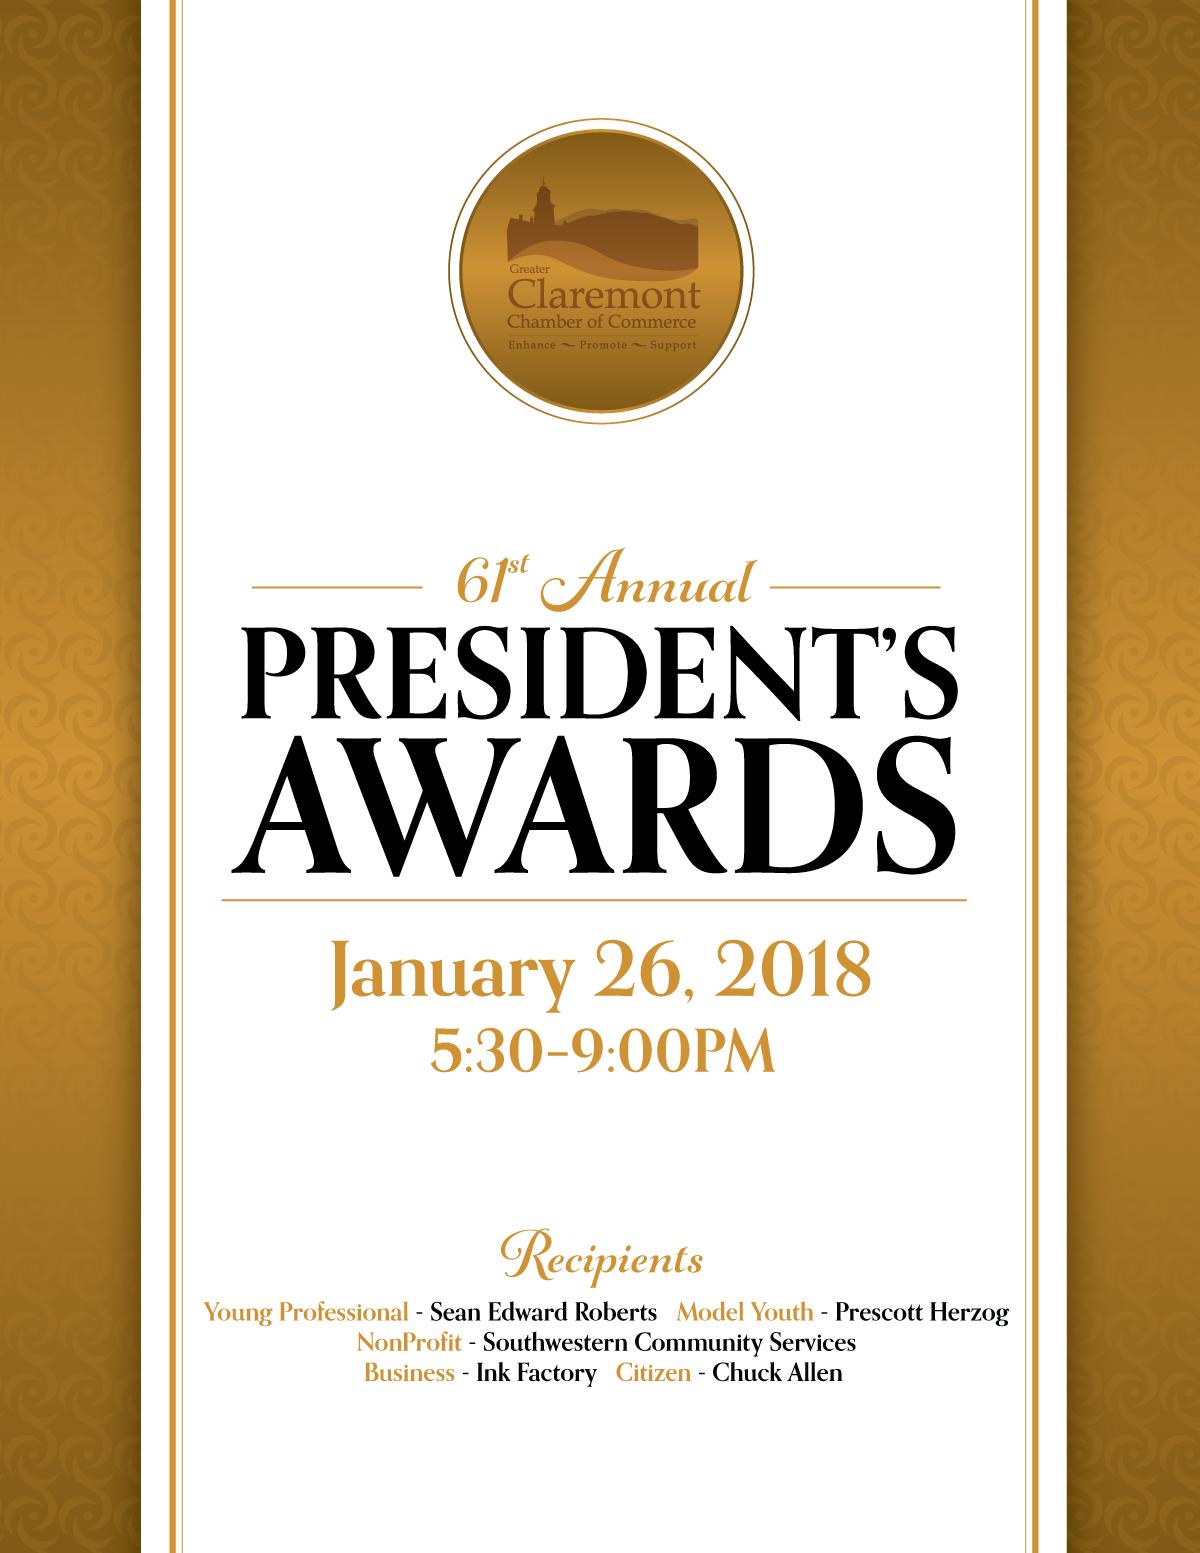 President's Award Recipients